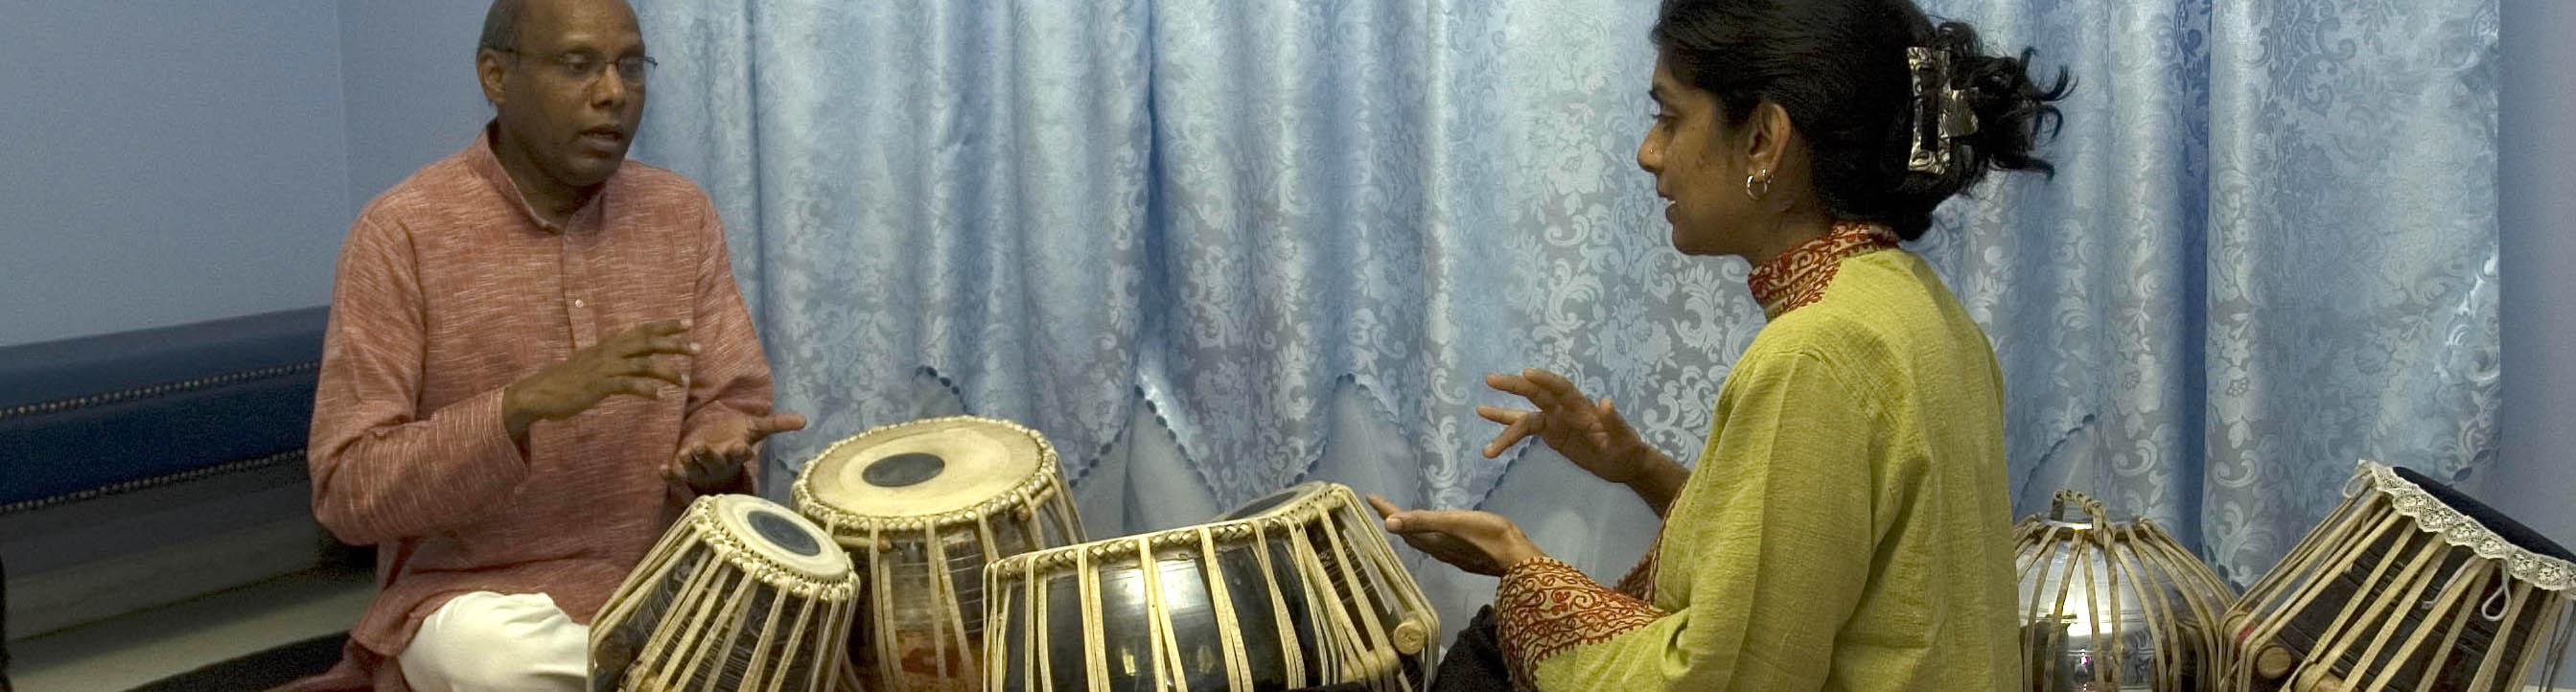 Chris Pereji playing tabla drums with apprentice Nisha Purushotham. Photo by Maggie Holtzberg.